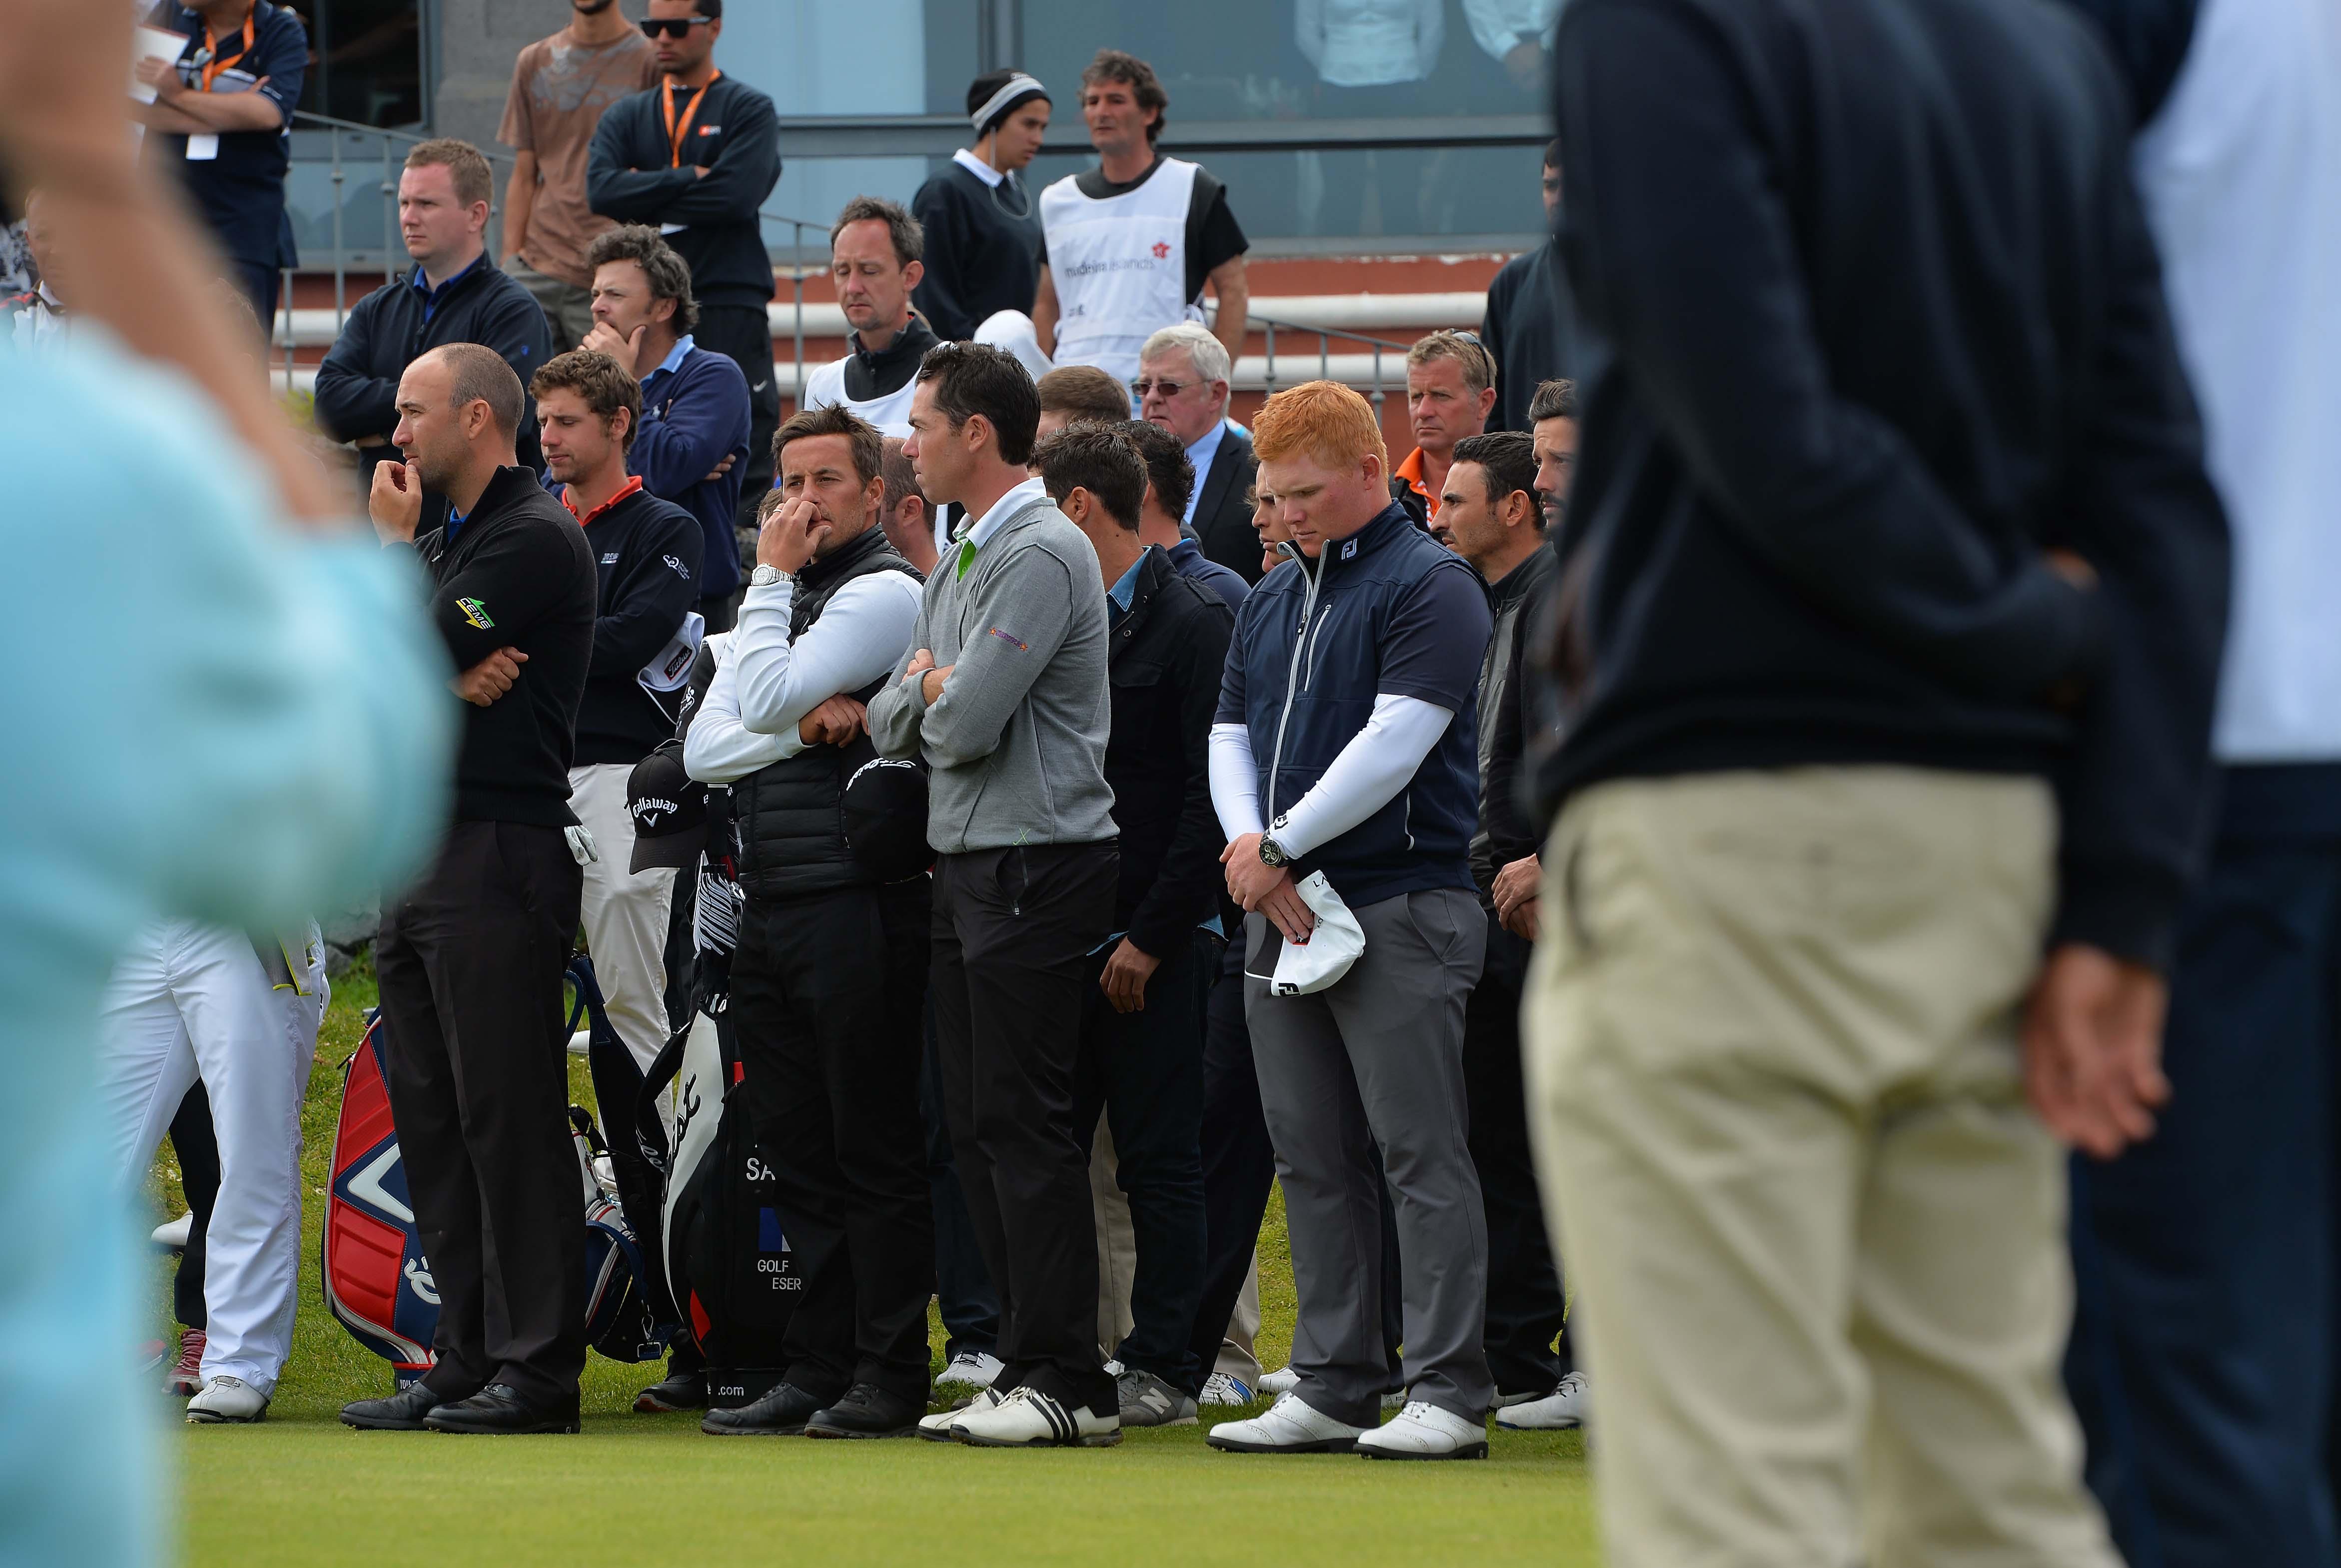 Caddie Ian McGregor dies during tournament